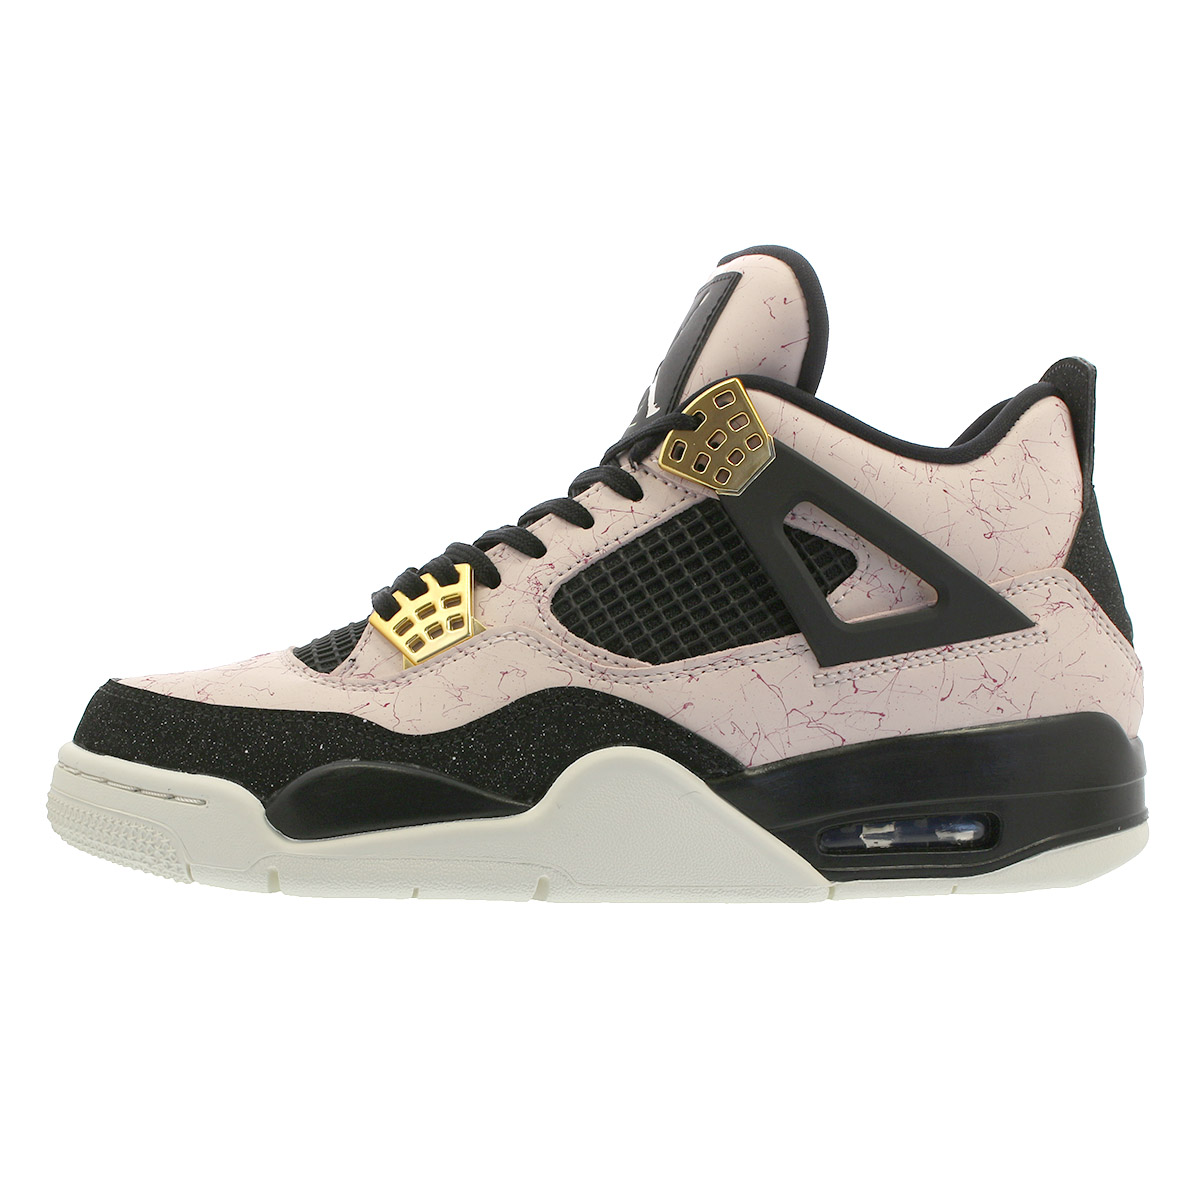 info for 3fd65 c75b6 NIKE WMNS AIR JORDAN 4 RETRO Nike women Air Jordan 4 nostalgic SILT  RED/BLACK/PHANTOM/VOLT aq9129-601